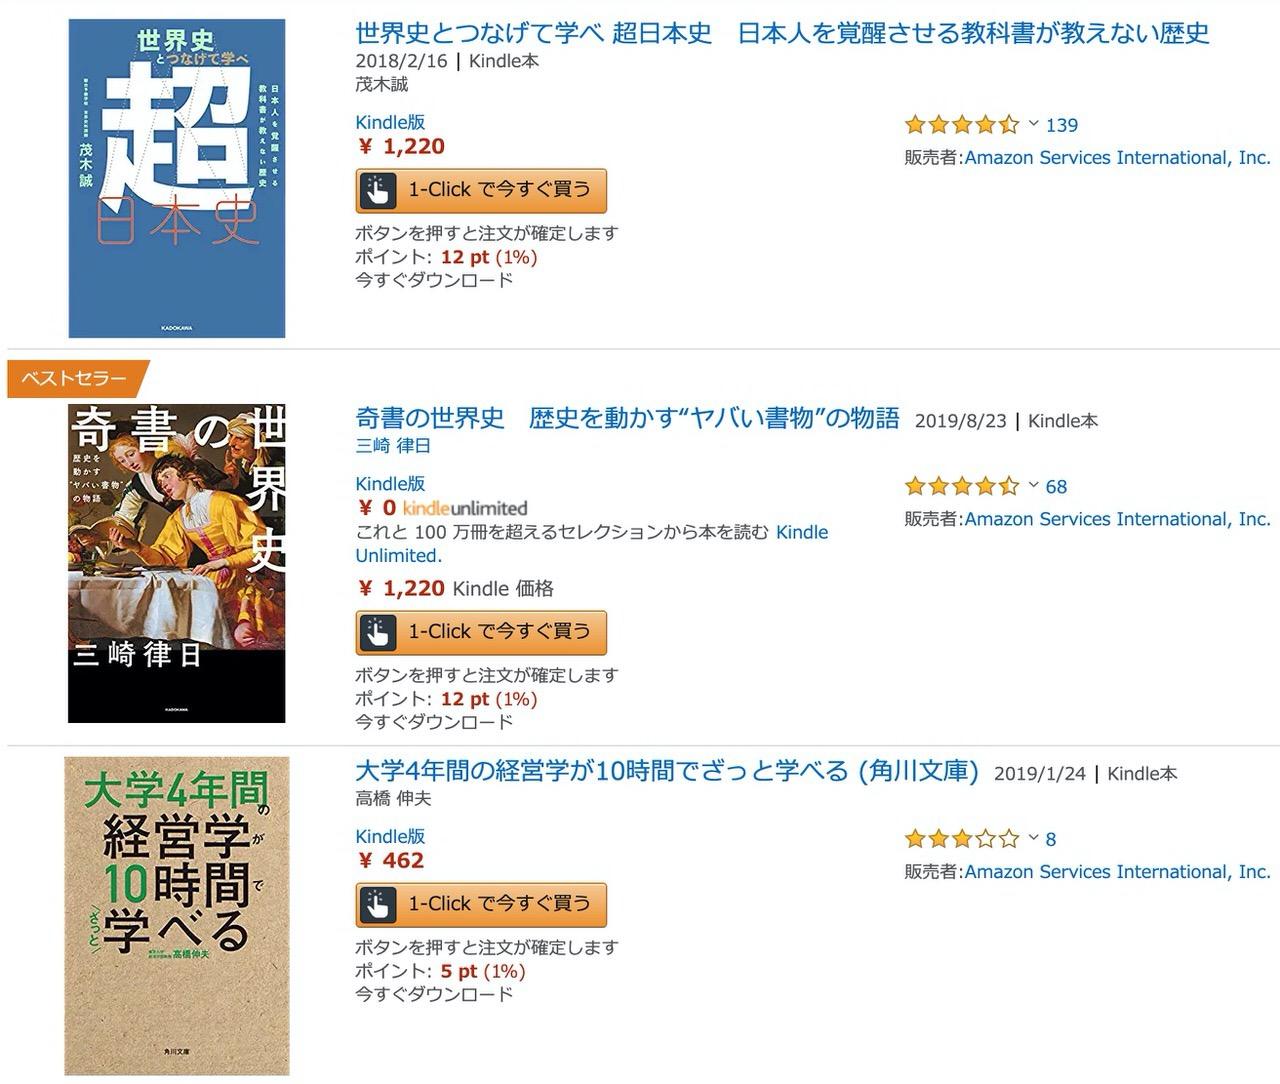 【Kindleセール】「図解・マンガ スキル本&教養本フェア」開催中(3/19まで)